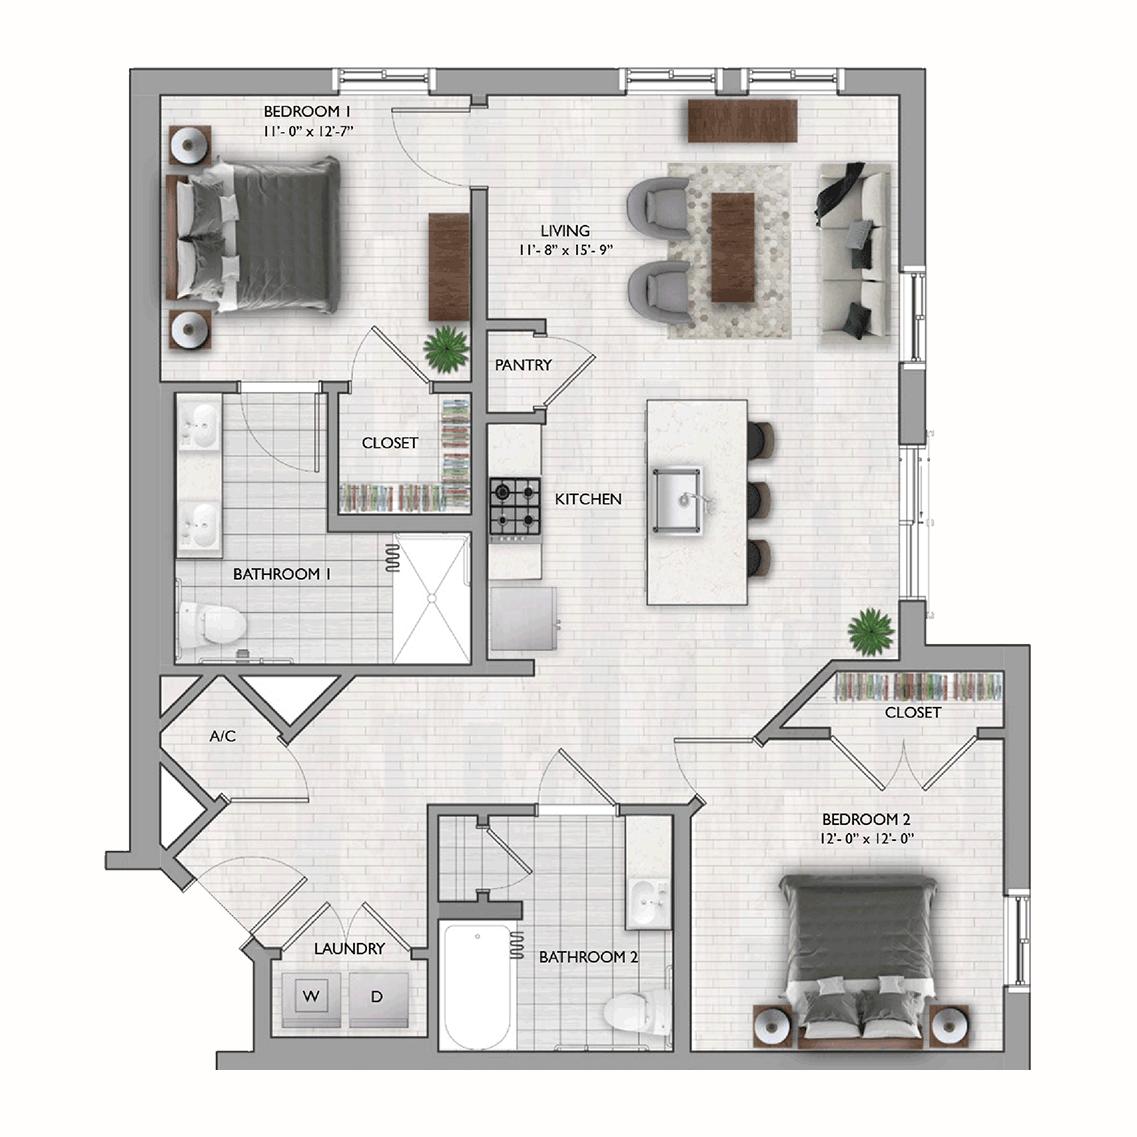 B2-floor-plan-Renaissance-West-River-lg